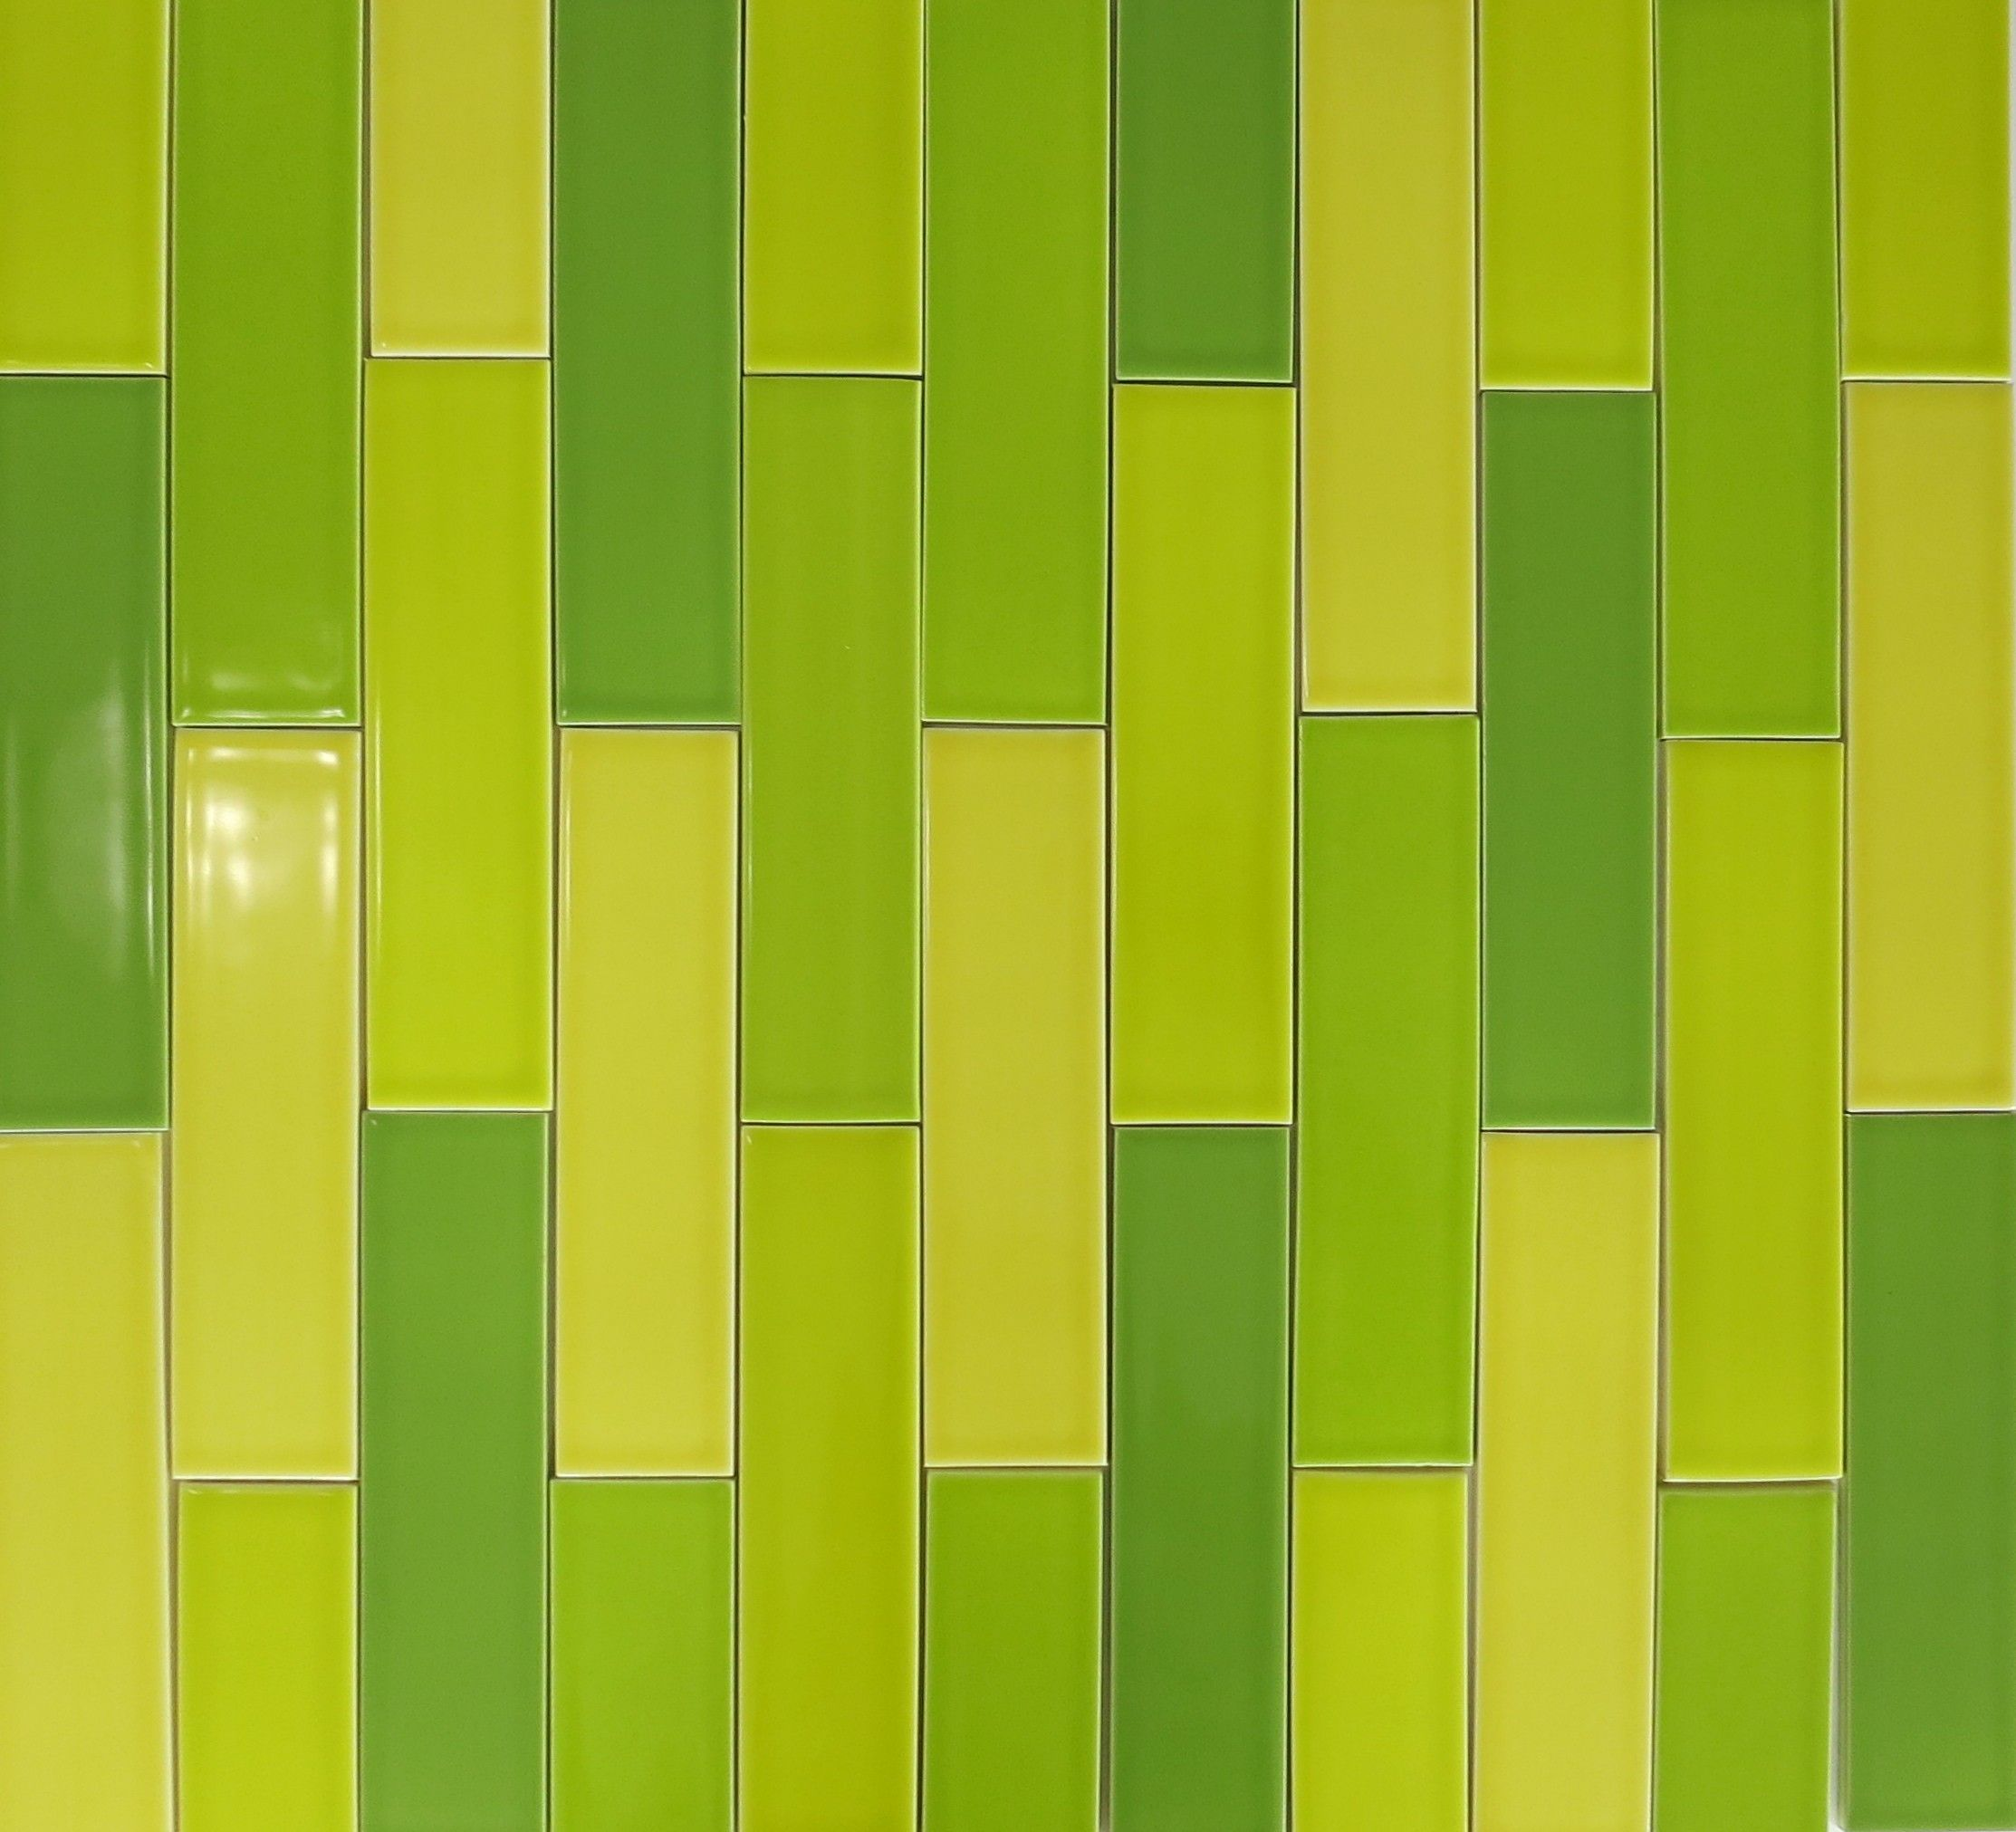 Excellent 12 Inch Ceiling Tiles Tall 12X12 Cork Floor Tiles Flat 12X12 Tin Ceiling Tiles 16 X 24 Tile Floor Patterns Old 1930S Floor Tiles Brown2X4 Glass Tile Backsplash Kiln Ceramic 2x8 Subway Tile Chartreuse Green Vertical Close Up ..